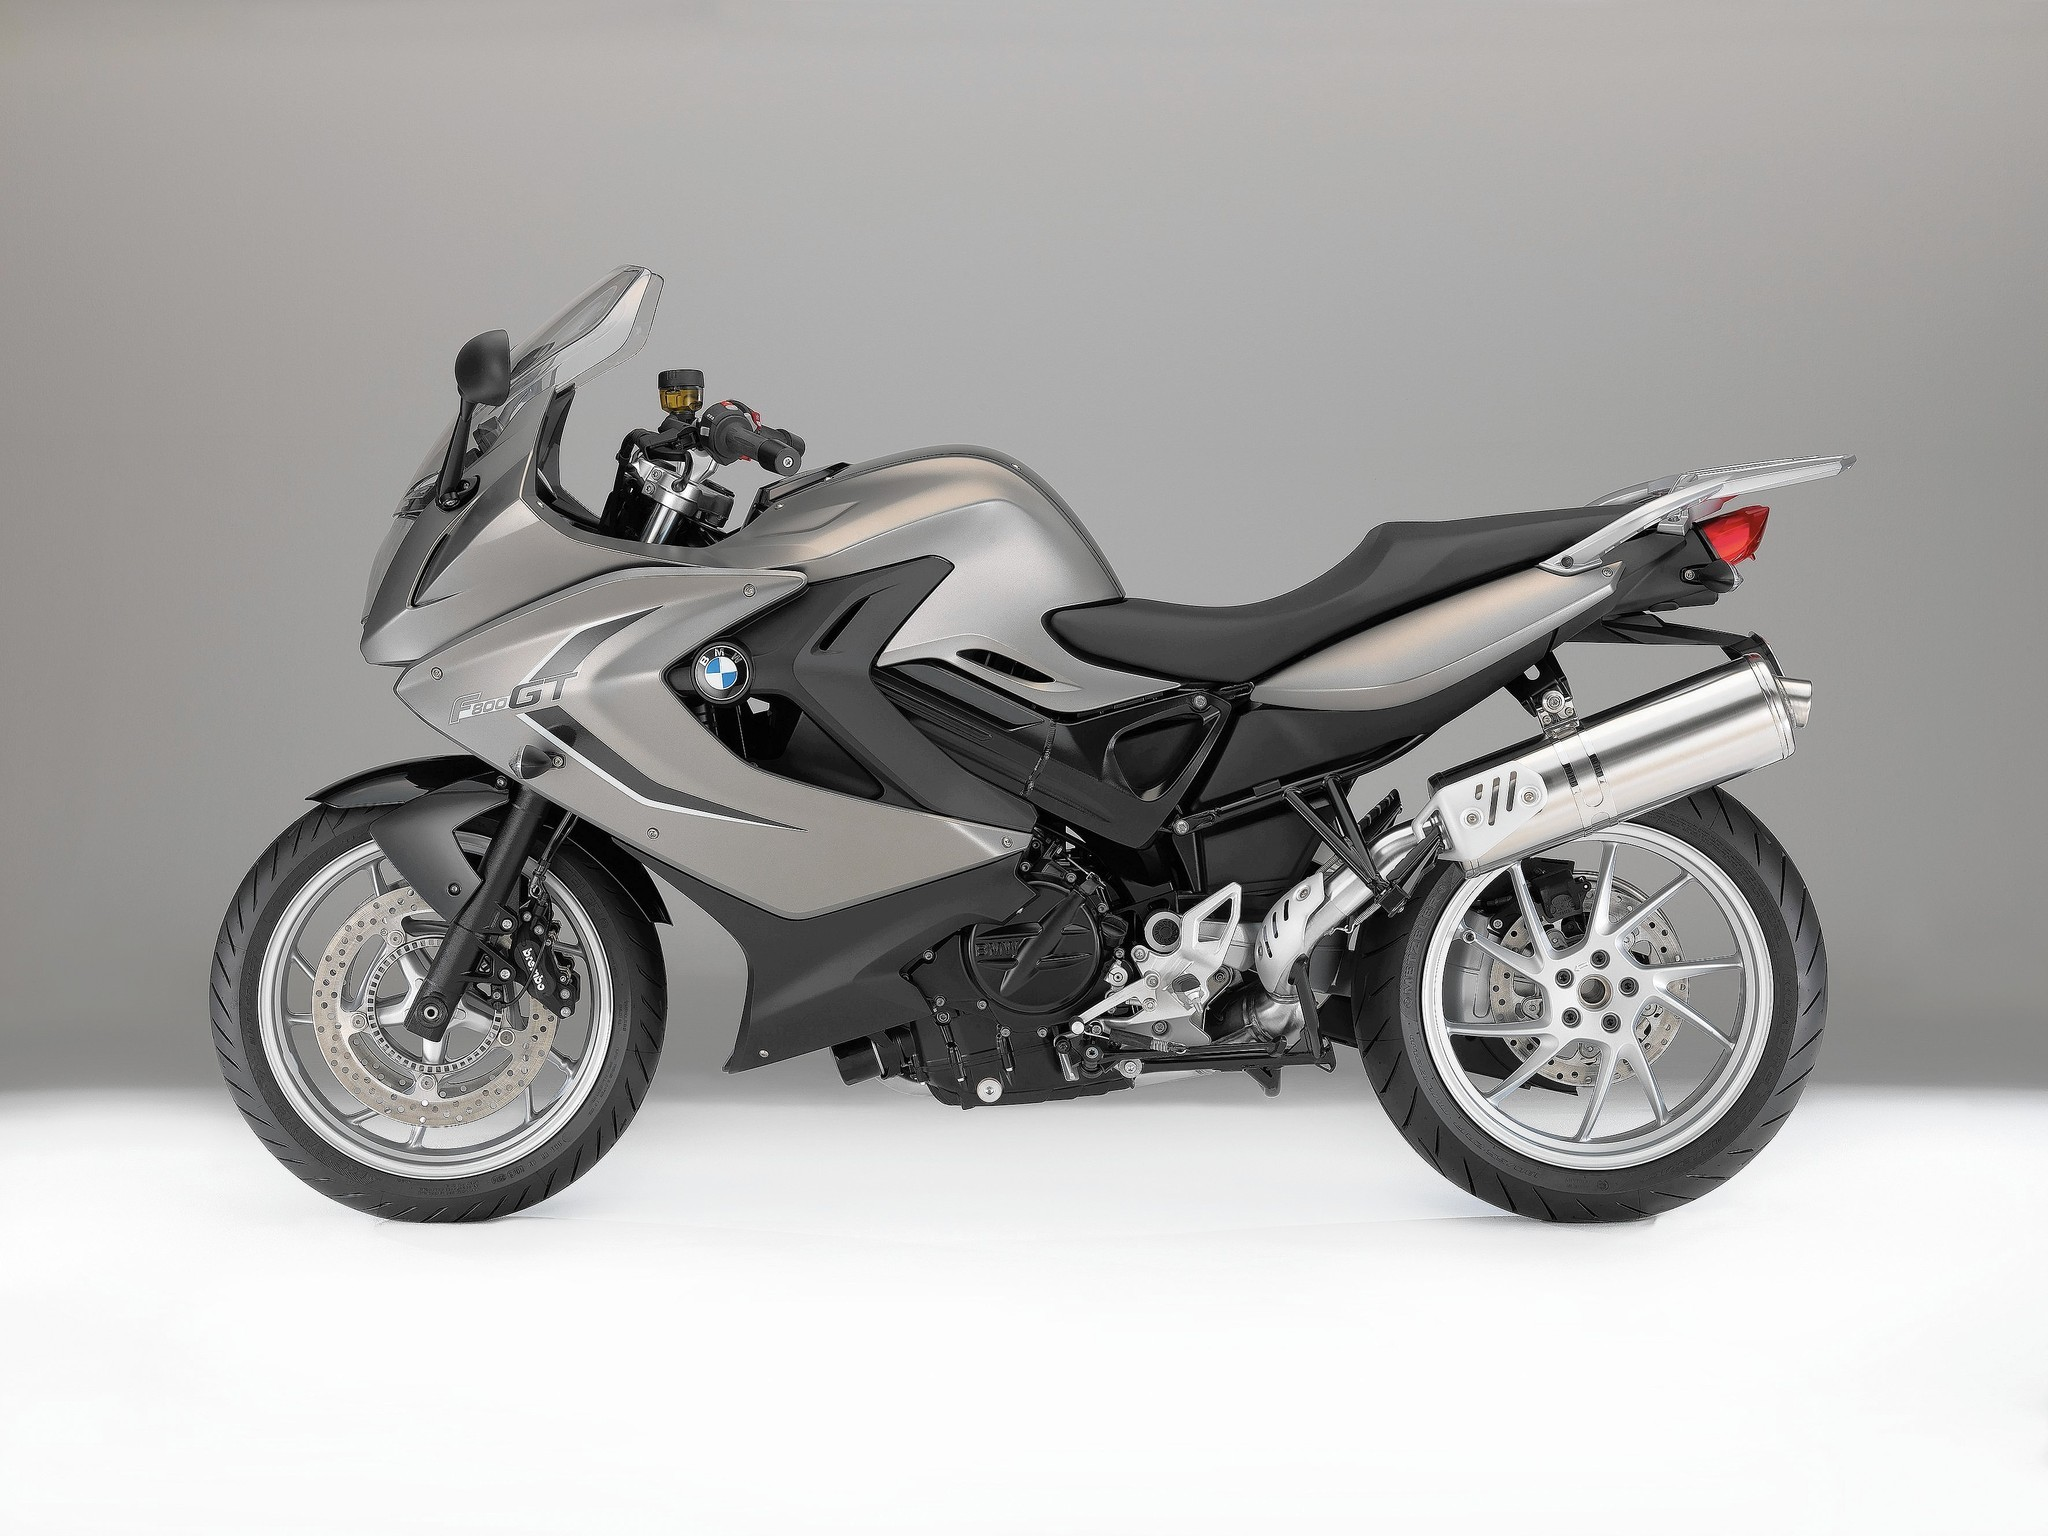 best motorcycles for women - chicago tribune